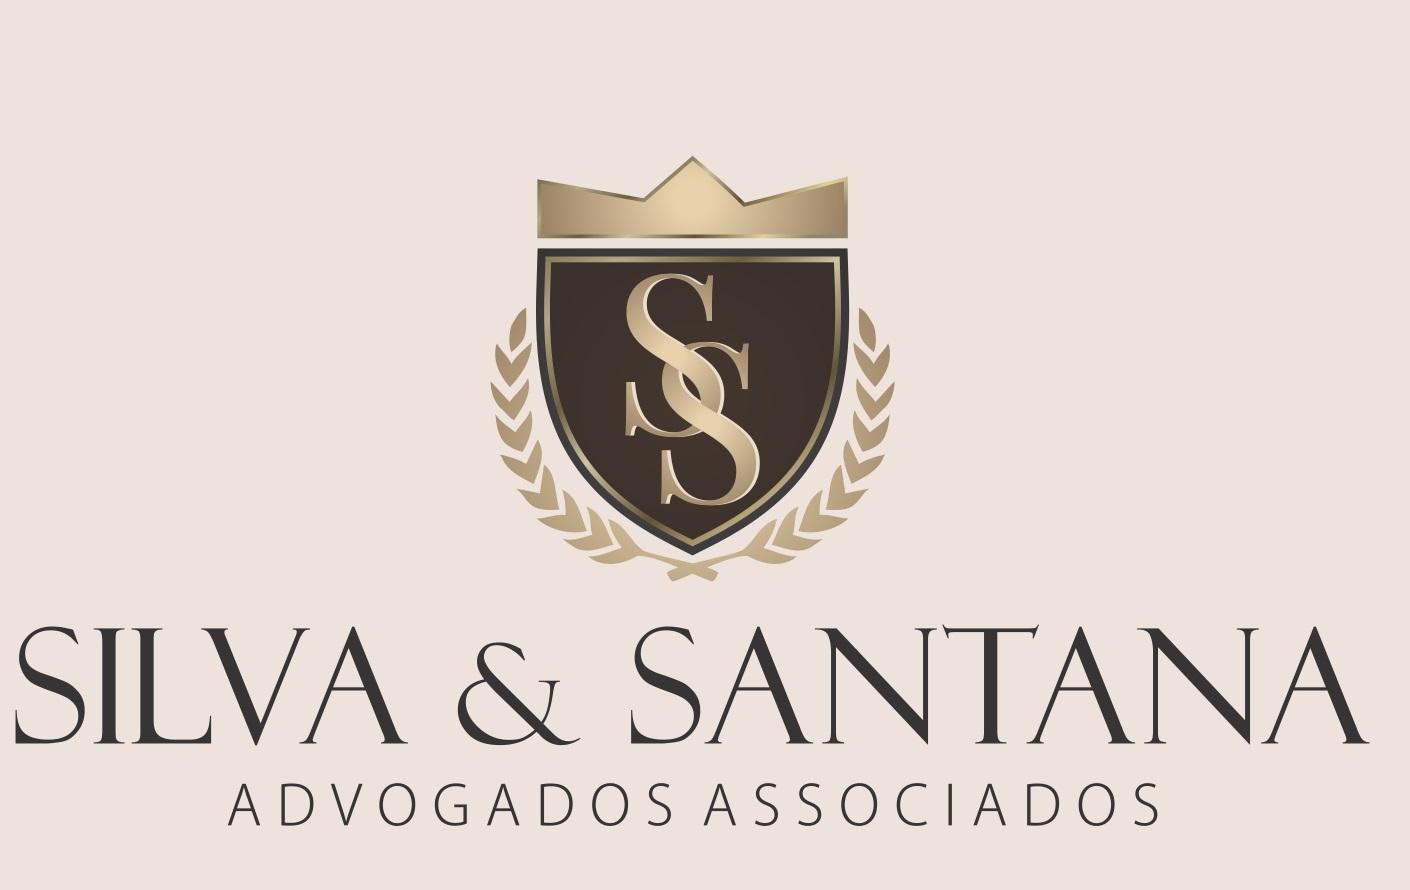 Silva & Santana Advogados